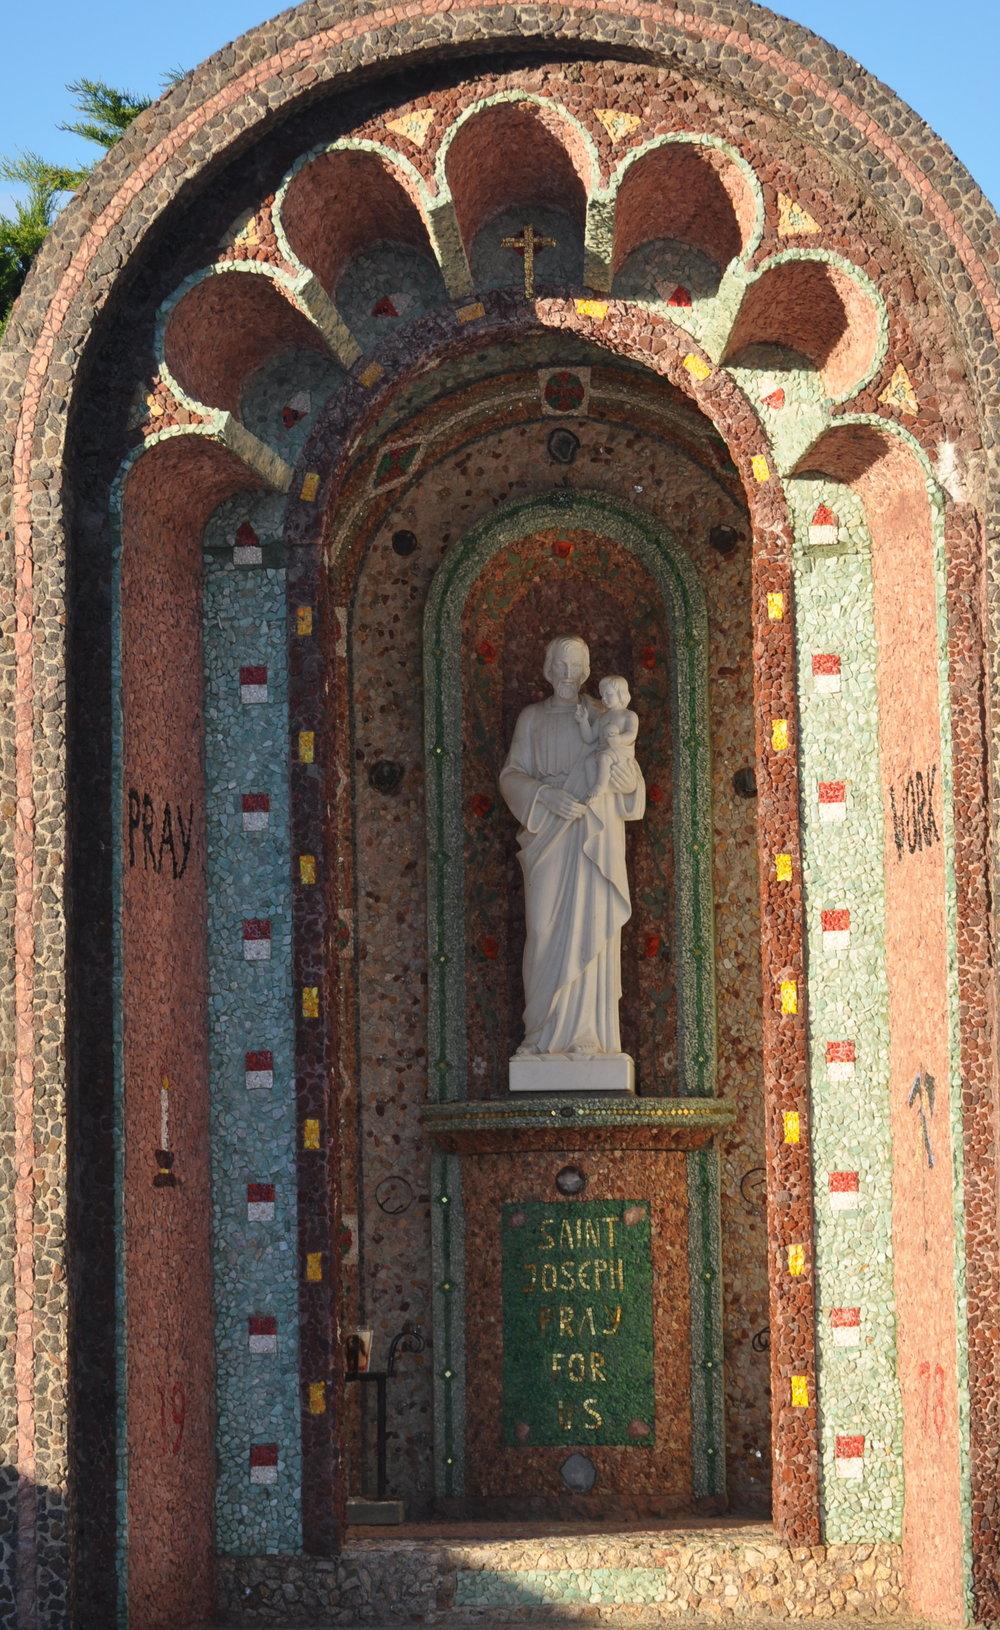 Grotto of St. Joseph